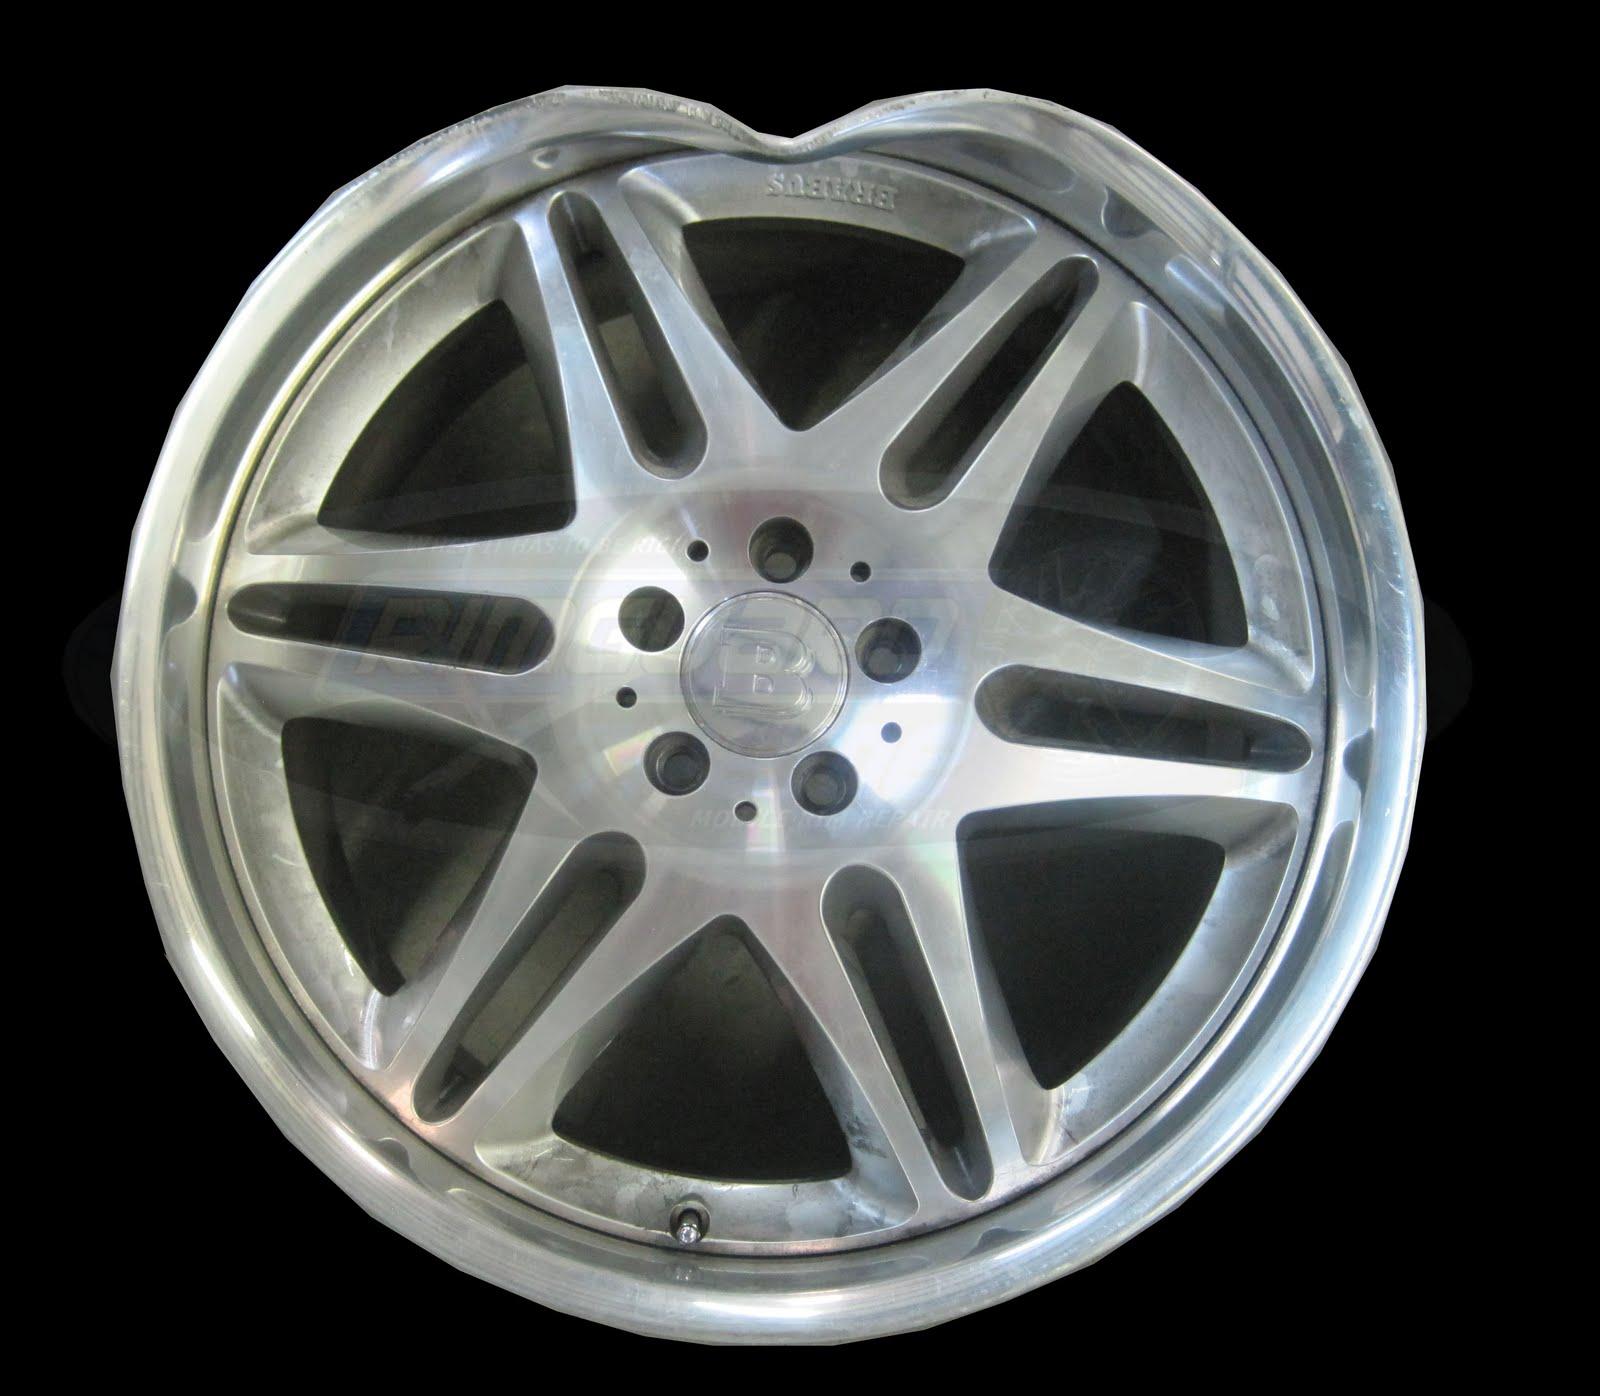 Toyota Richmond Va >> Alloy Mobile Wheel Rim Repair - RimGuard Xtreme, Inc: Got ...